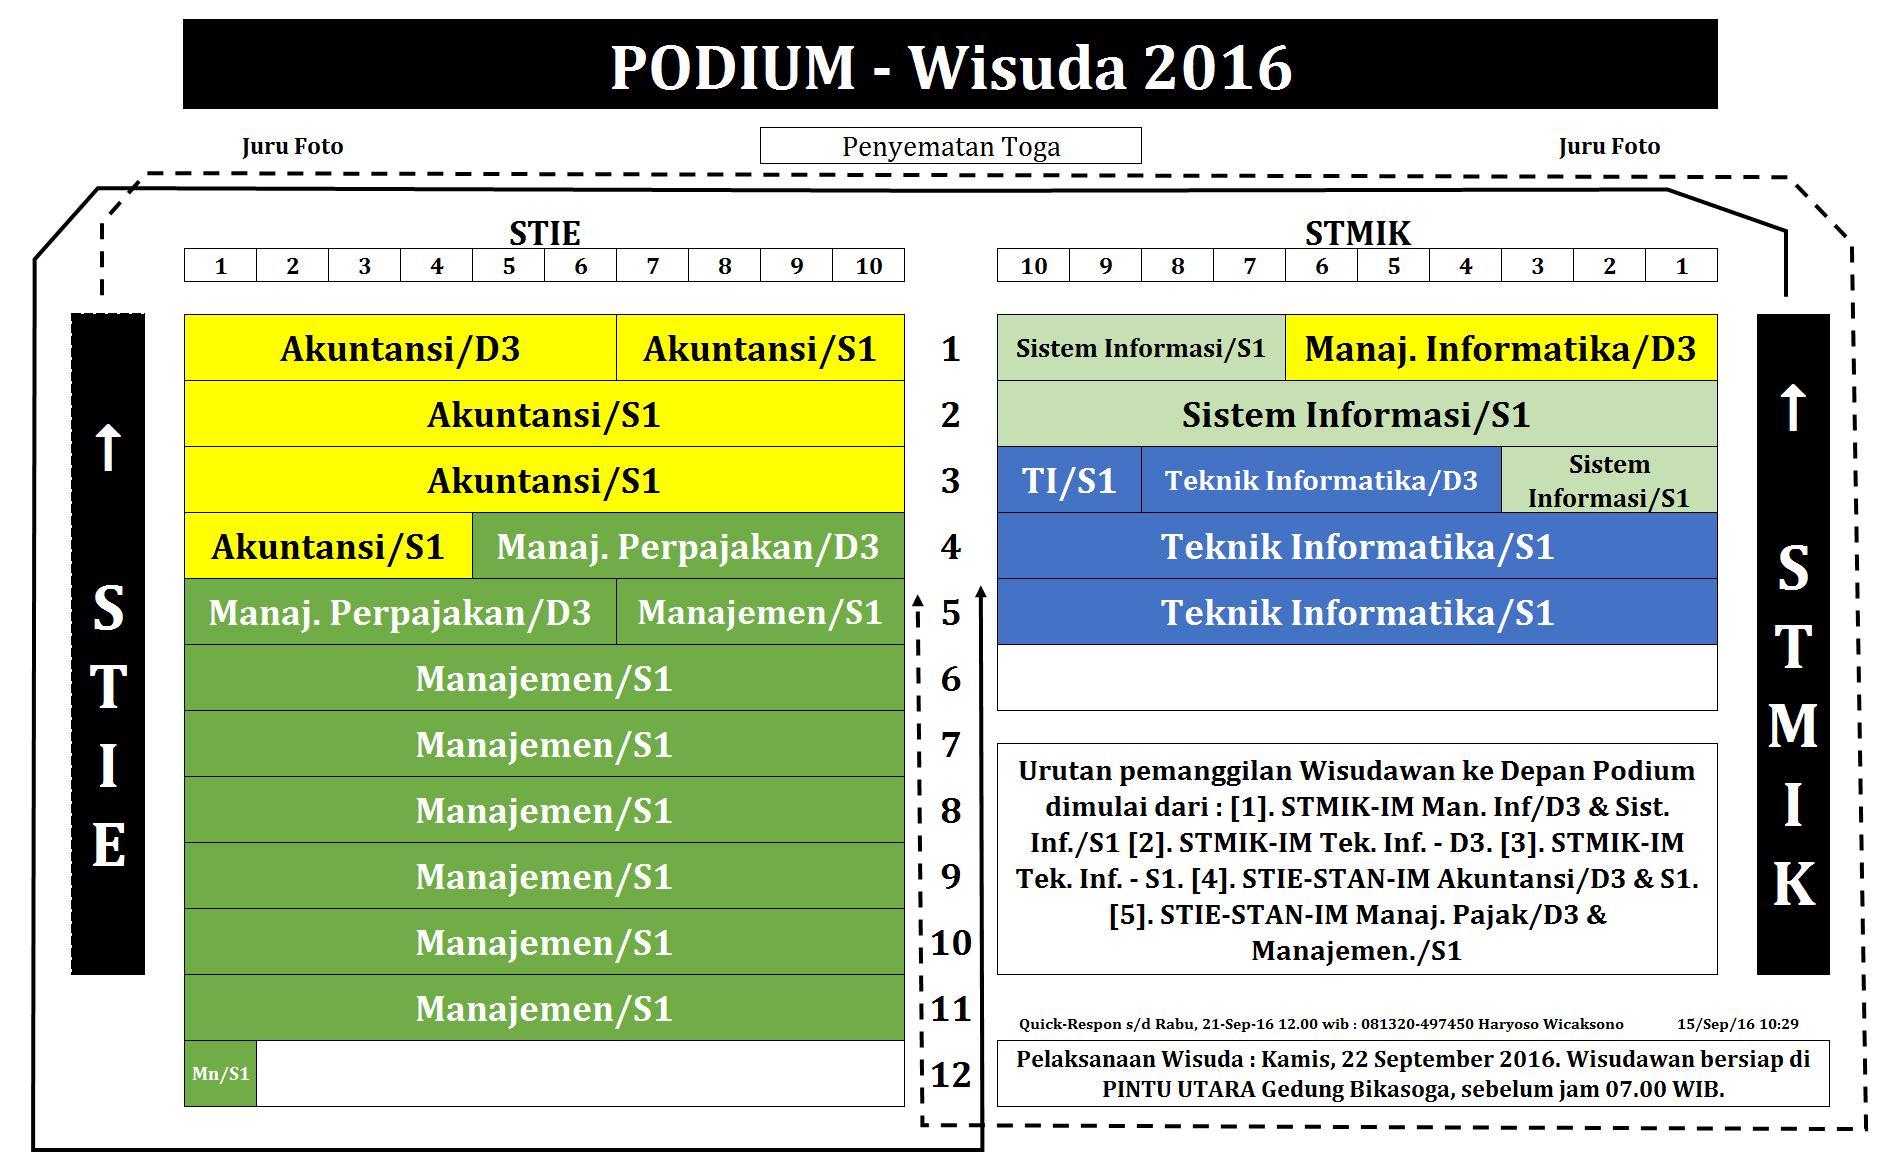 wisuda-2016-denah-1